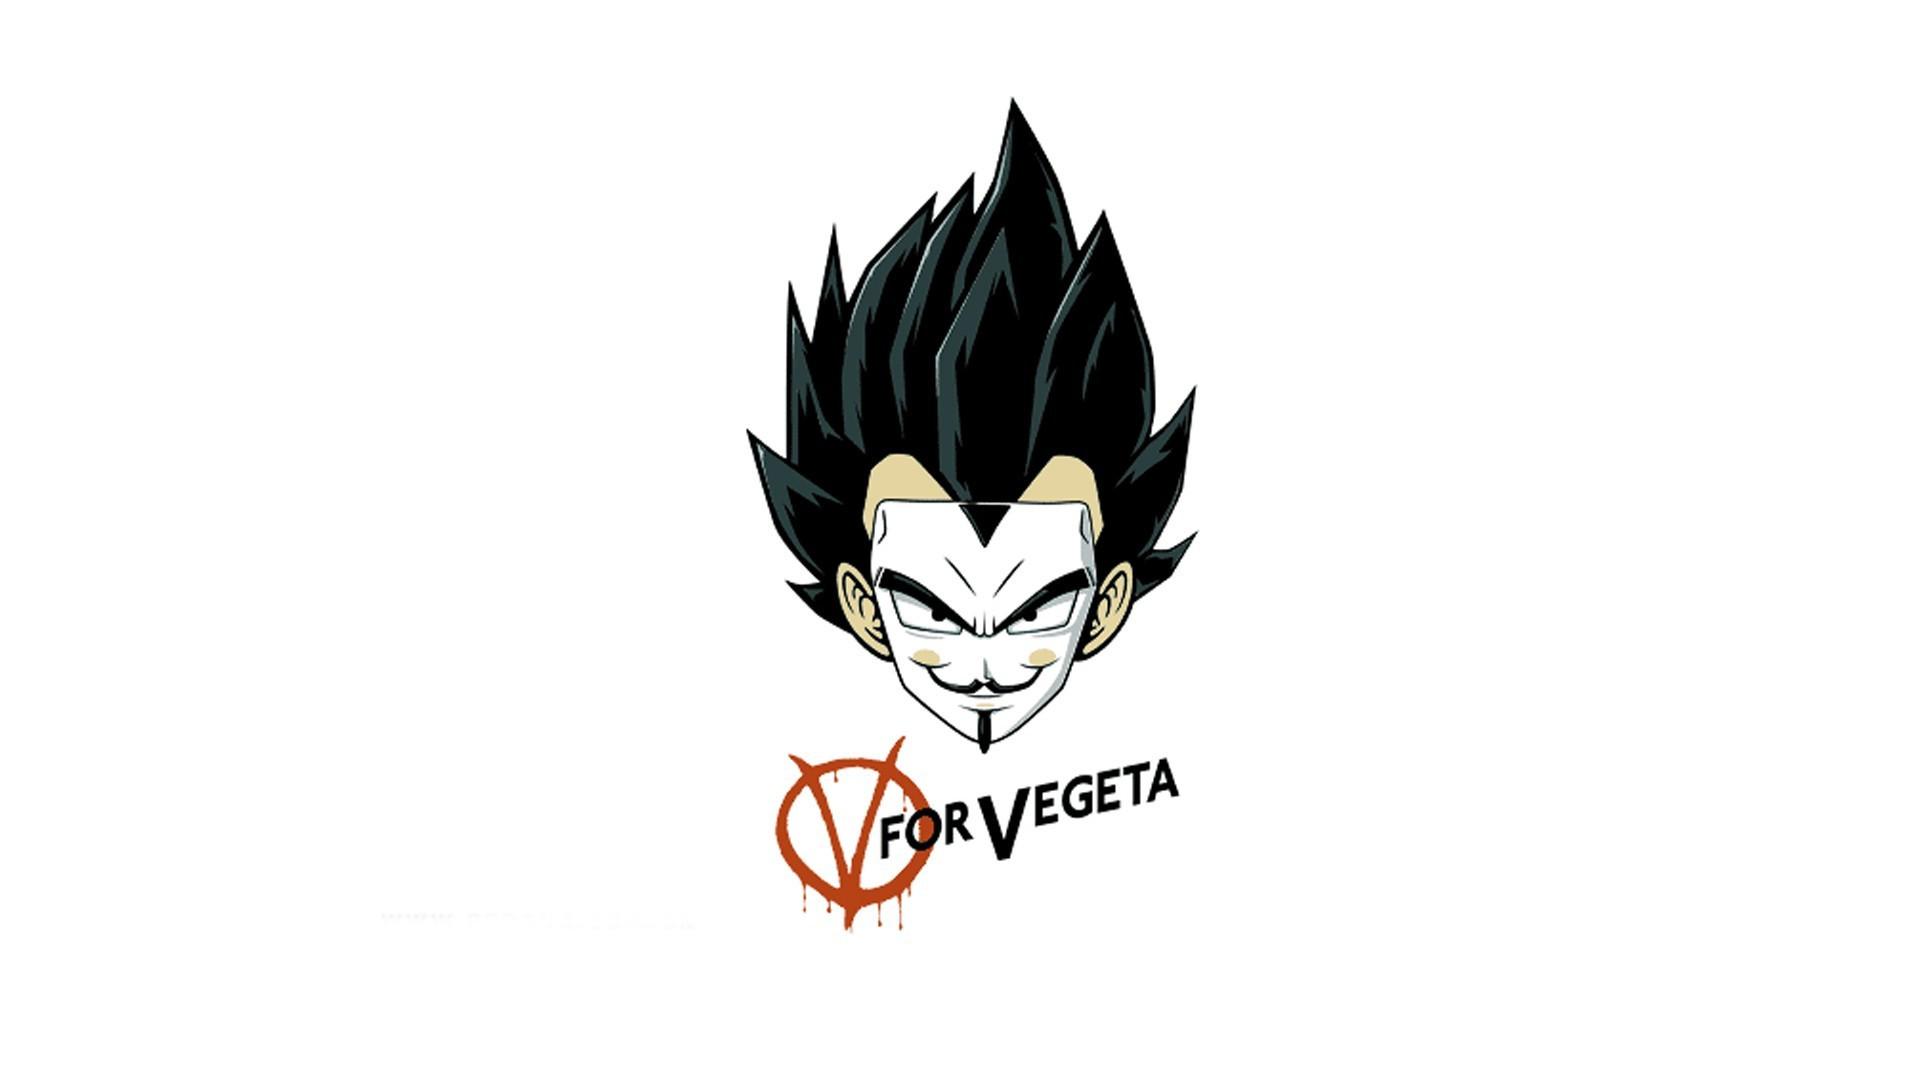 Free Desktop Vegeta Backgrounds.